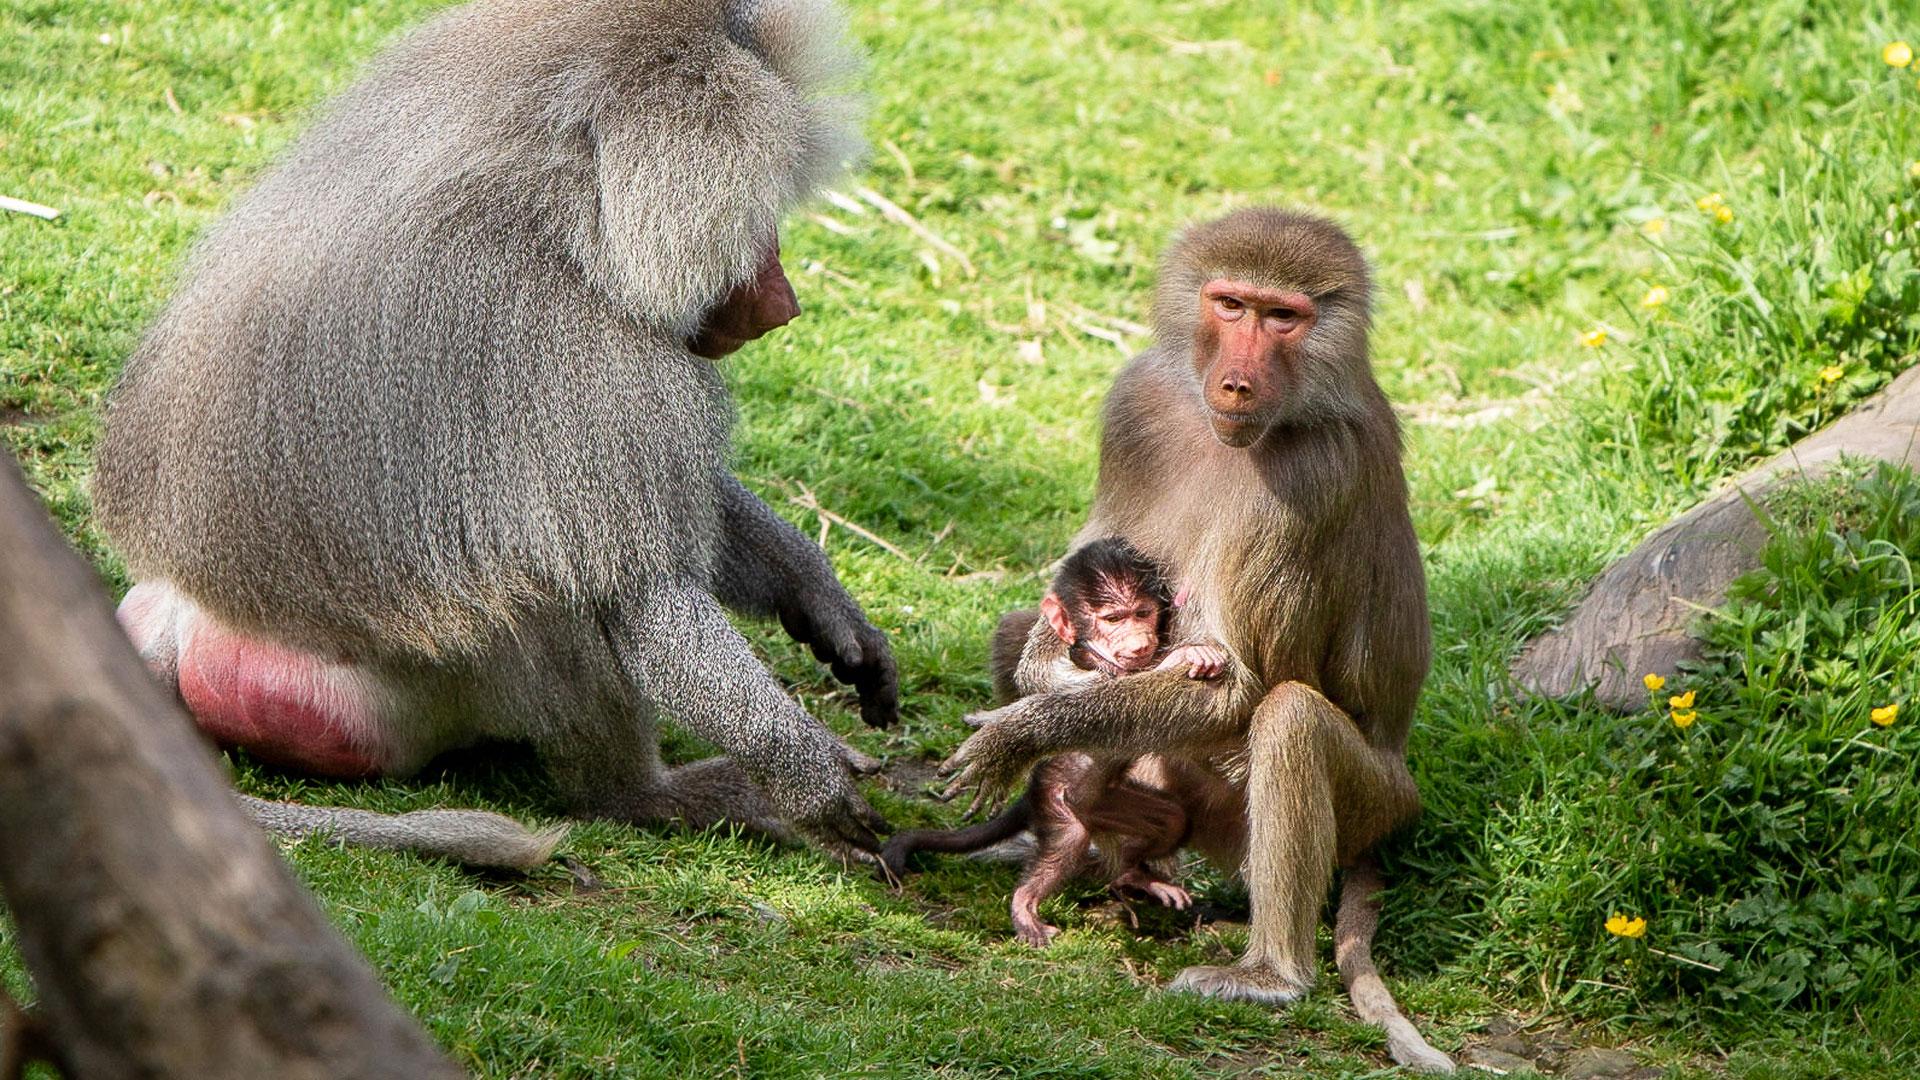 https://rfacdn.nz/zoo/assets/media/baboon-baby-gallery-1.jpg